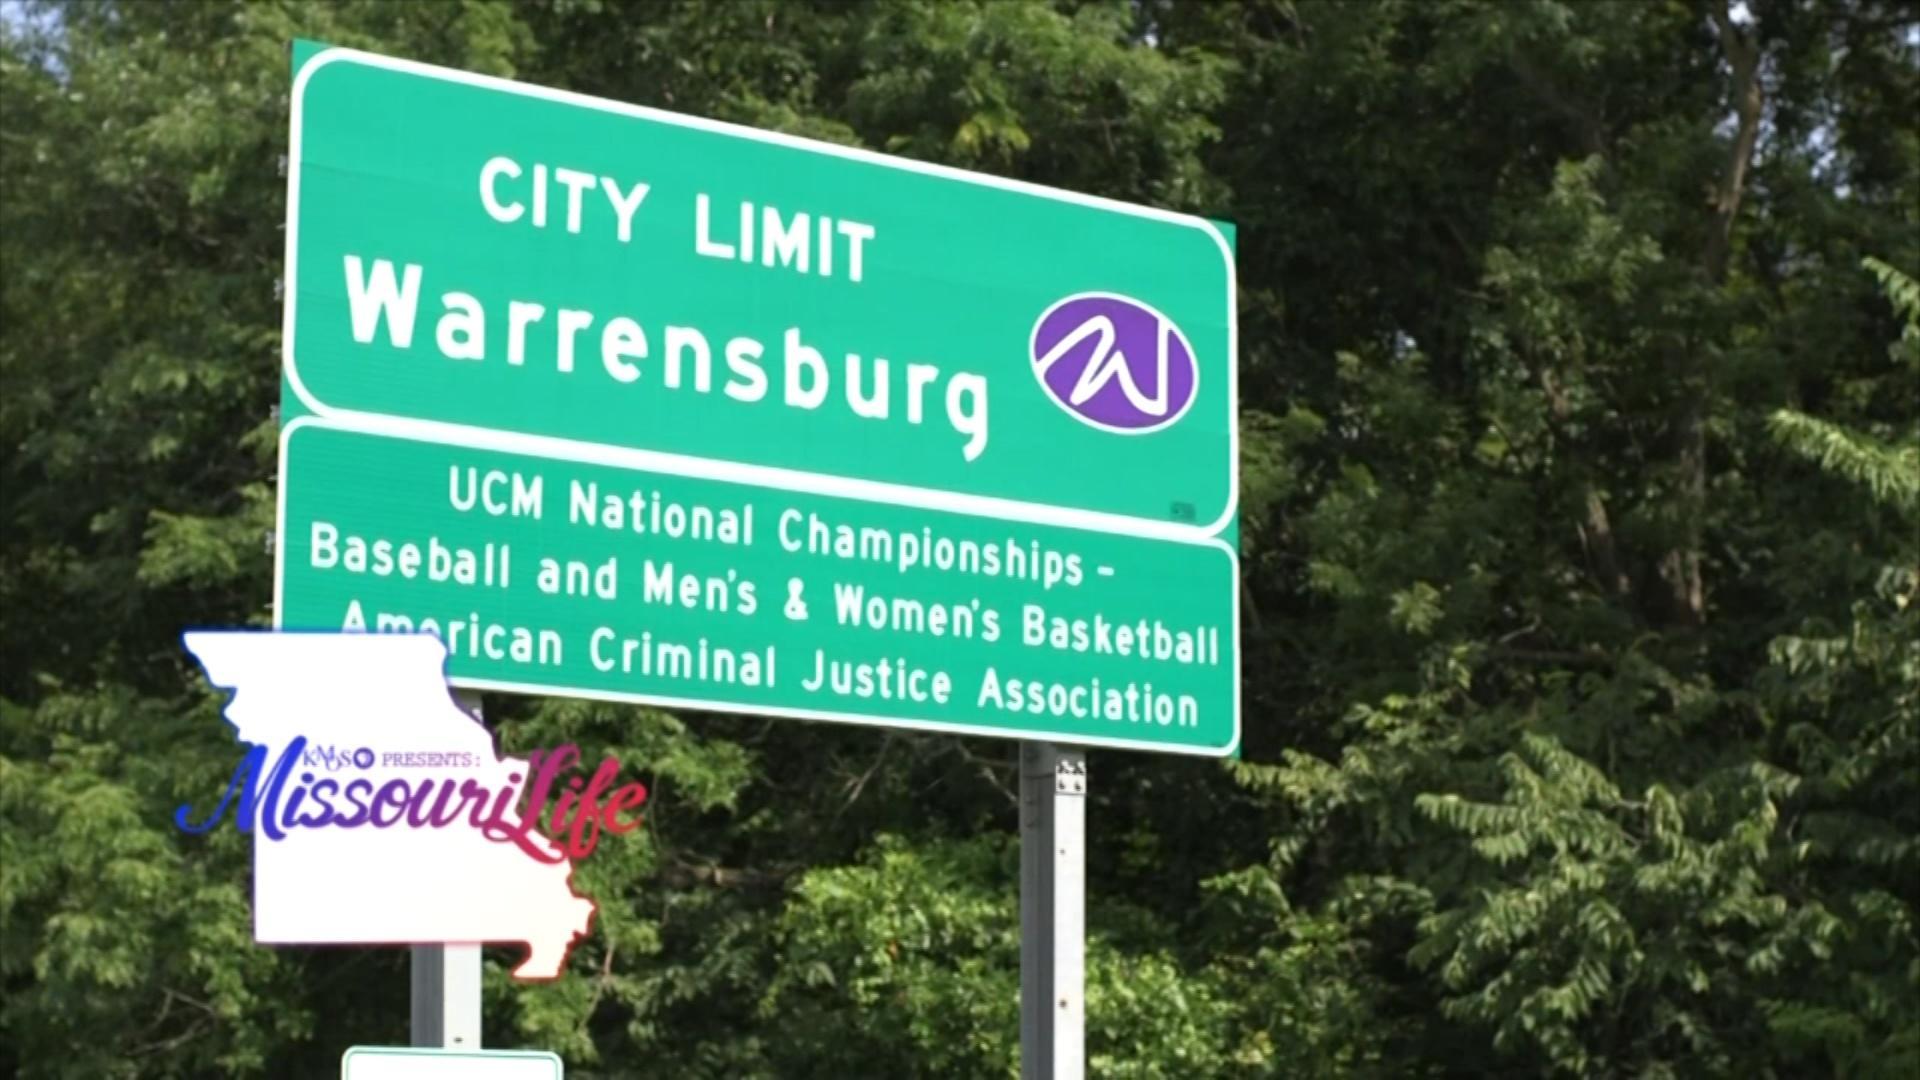 KMOS Presents Missouri Life Warrensburg